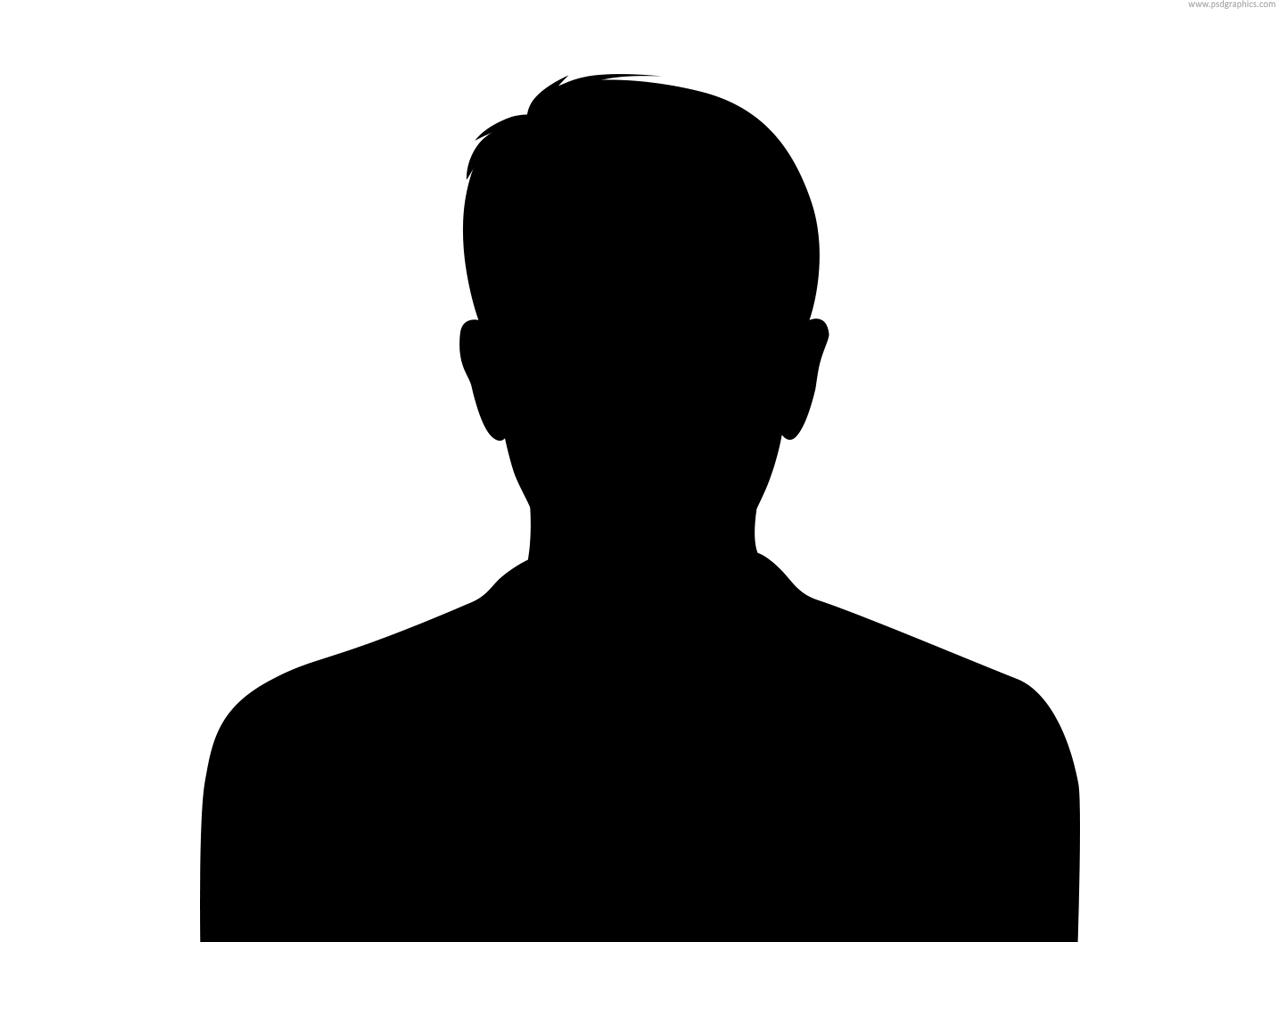 Silhouette portrait clipart jpg transparent stock Free Silhouette Profile, Download Free Clip Art, Free Clip ... jpg transparent stock